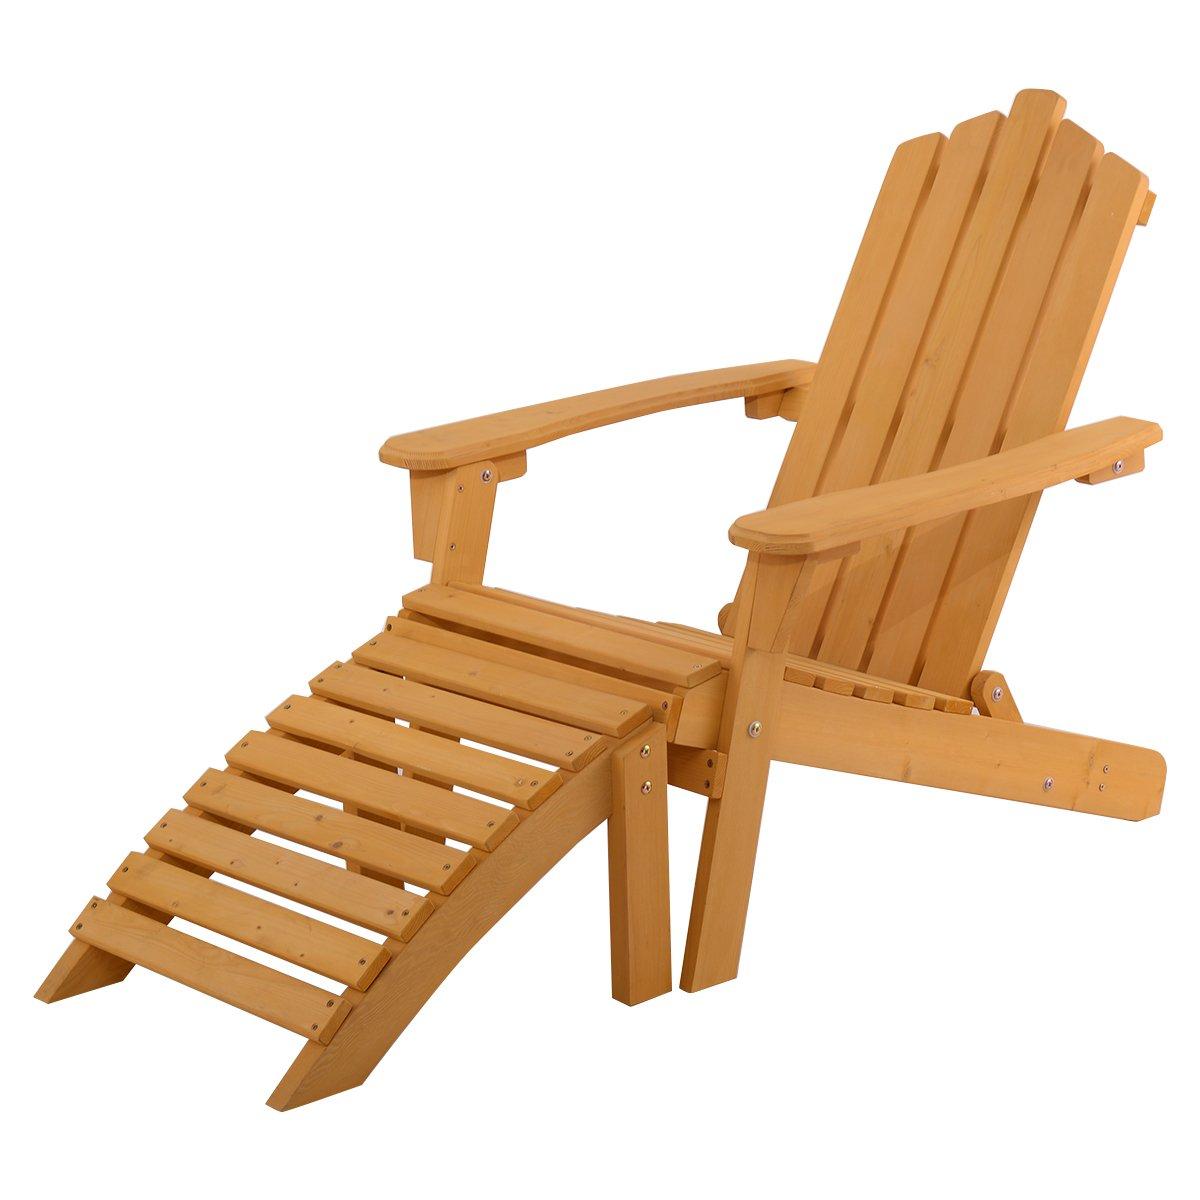 Giantex Wood Adirondack Chair w/Ottoman Outdoor Patio Deck Garden Lounge Furniture